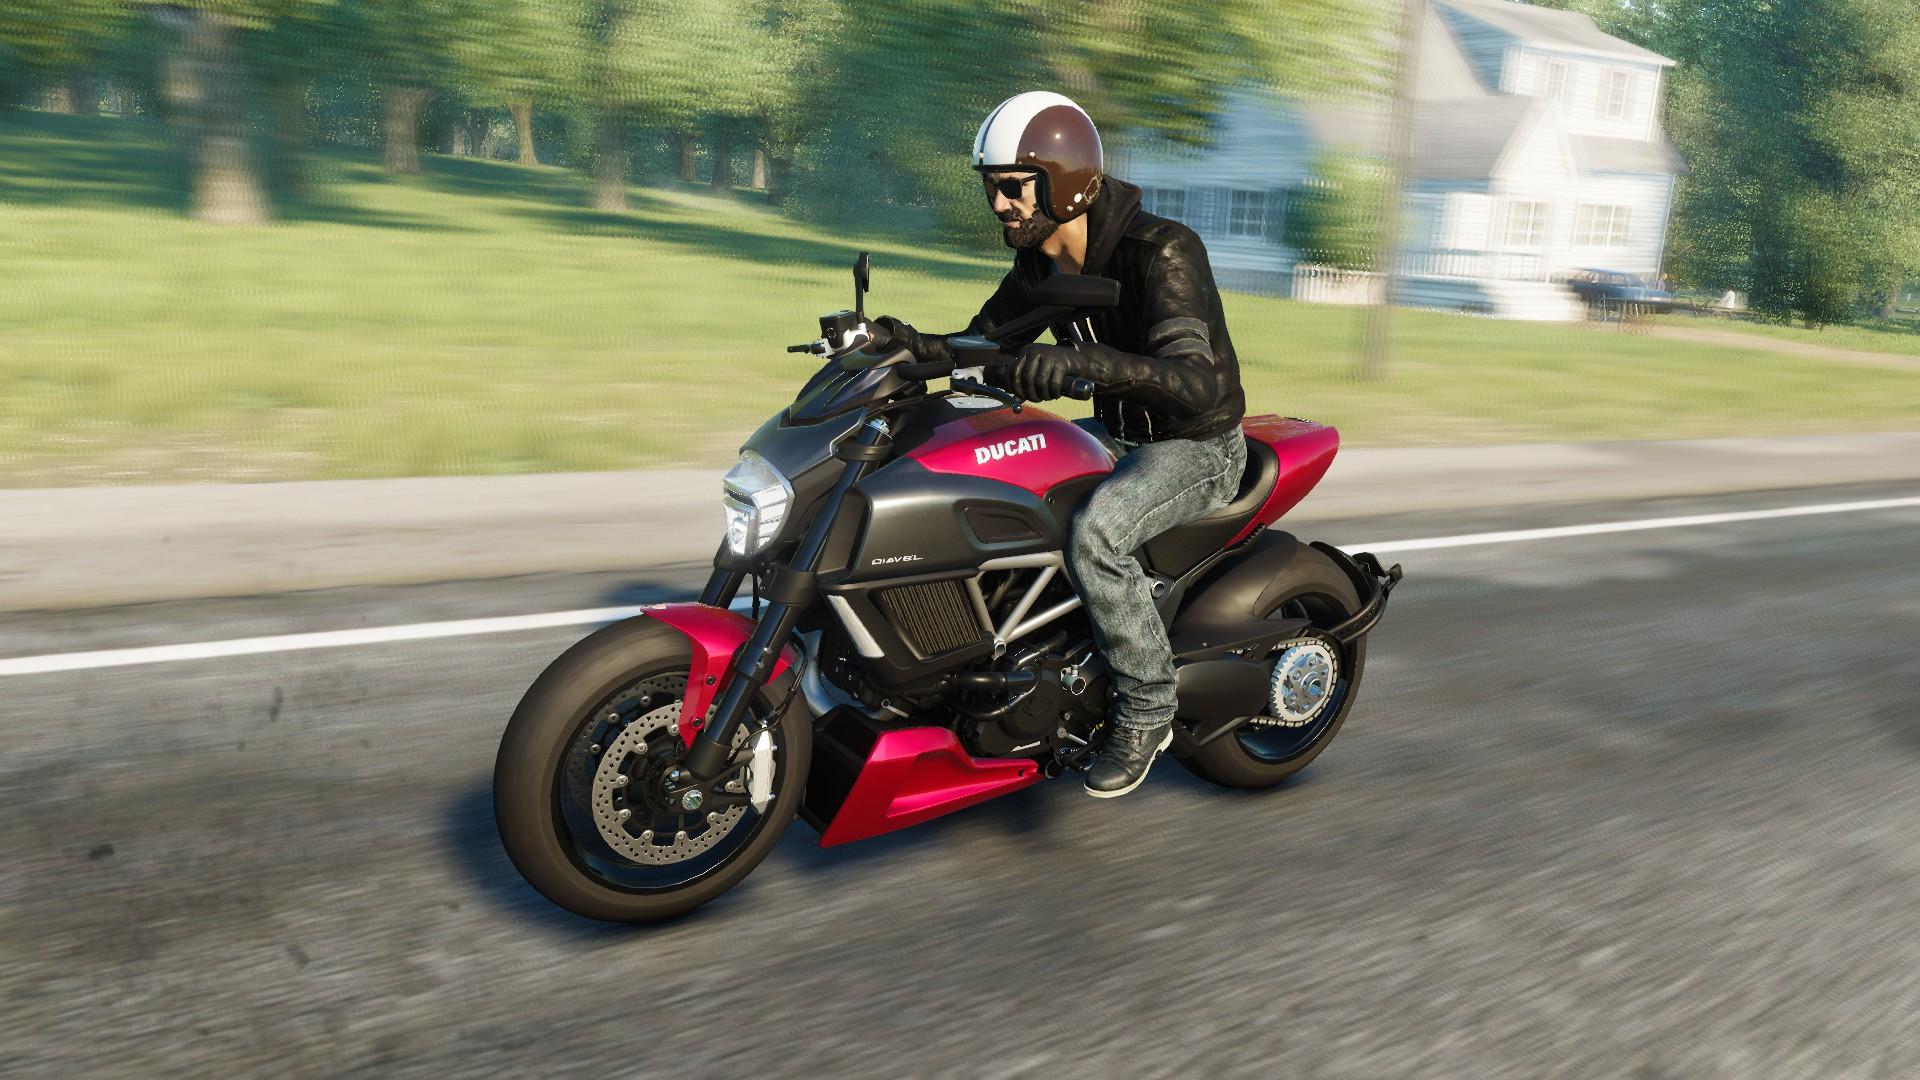 Ducati Diave... Ducati Bikes Wiki